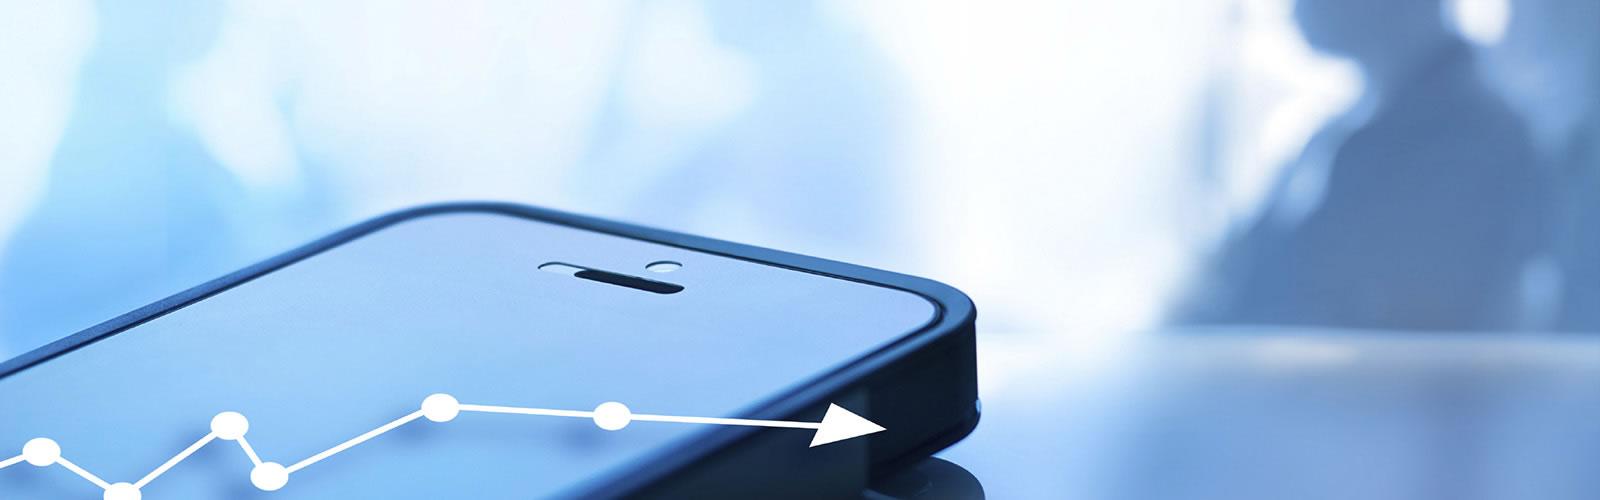 Mobile data network monitoring